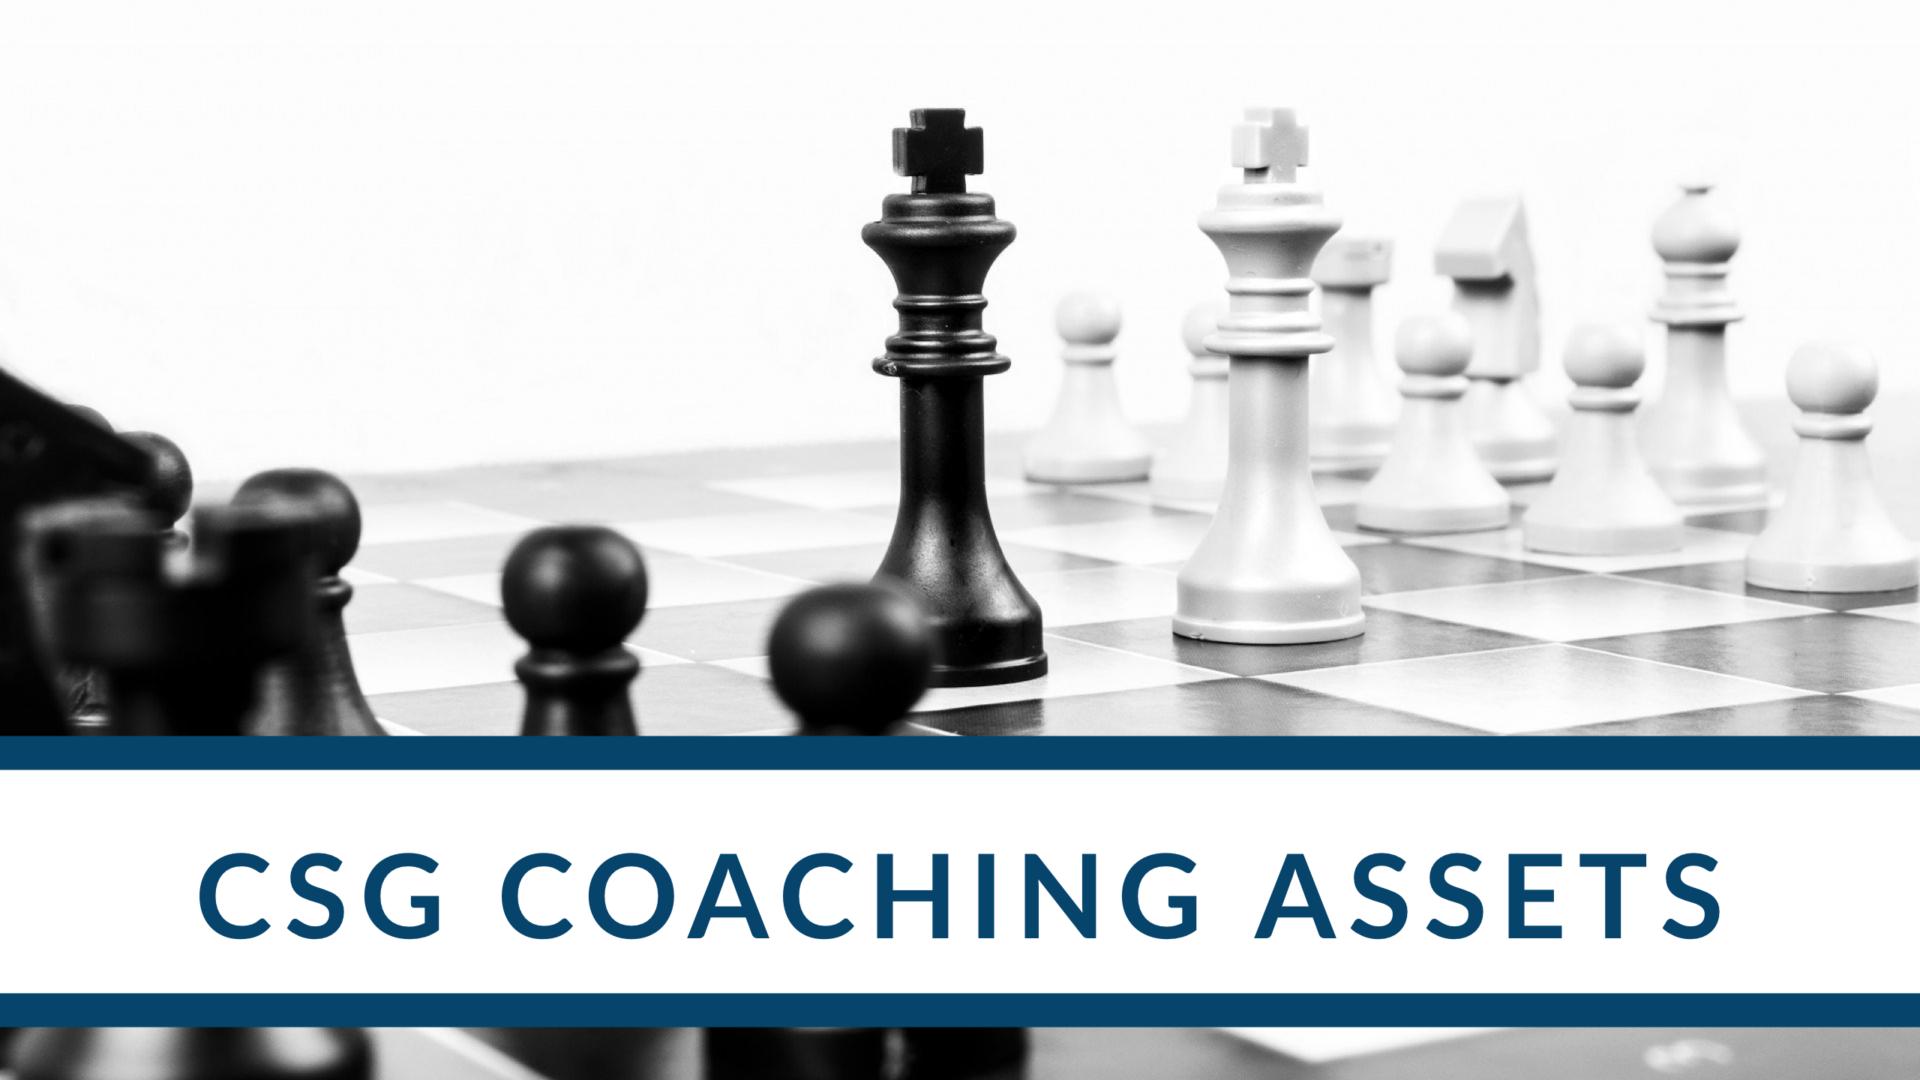 CSG Coaching Assets